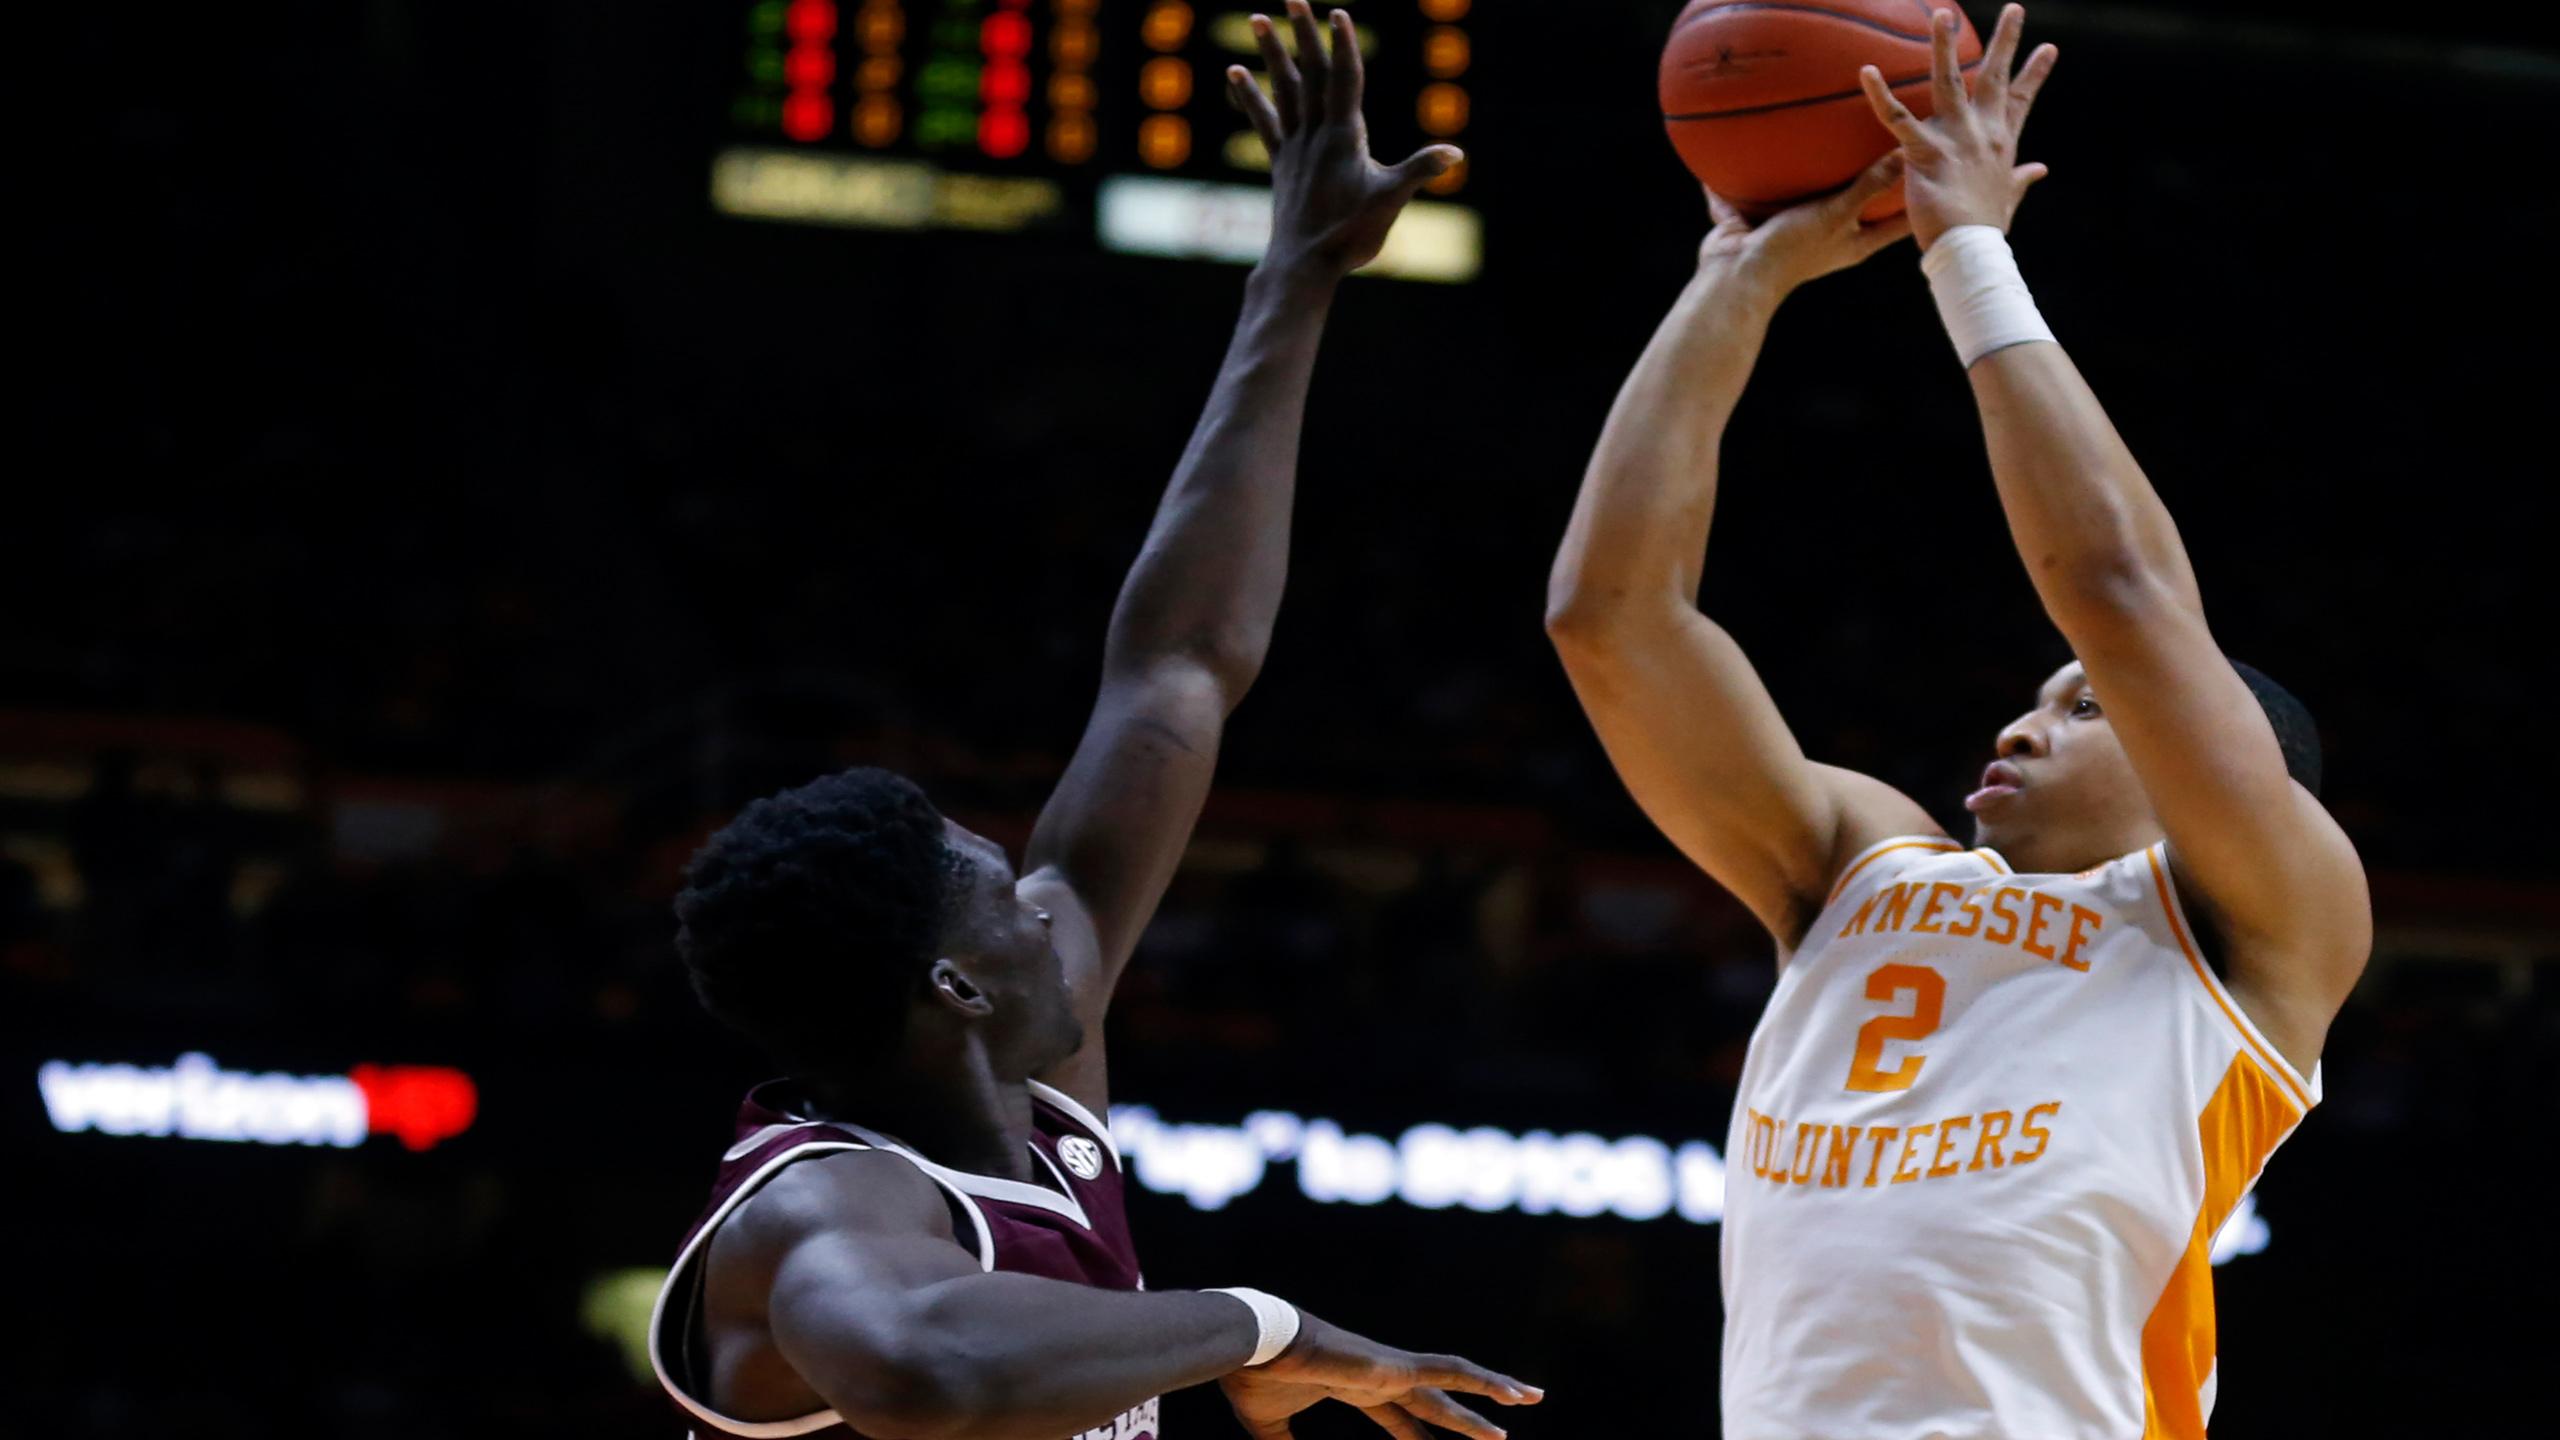 Mississippi State vs. #8 Tennessee (Quarterfinal #4) (SEC Men's Basketball Tournament)